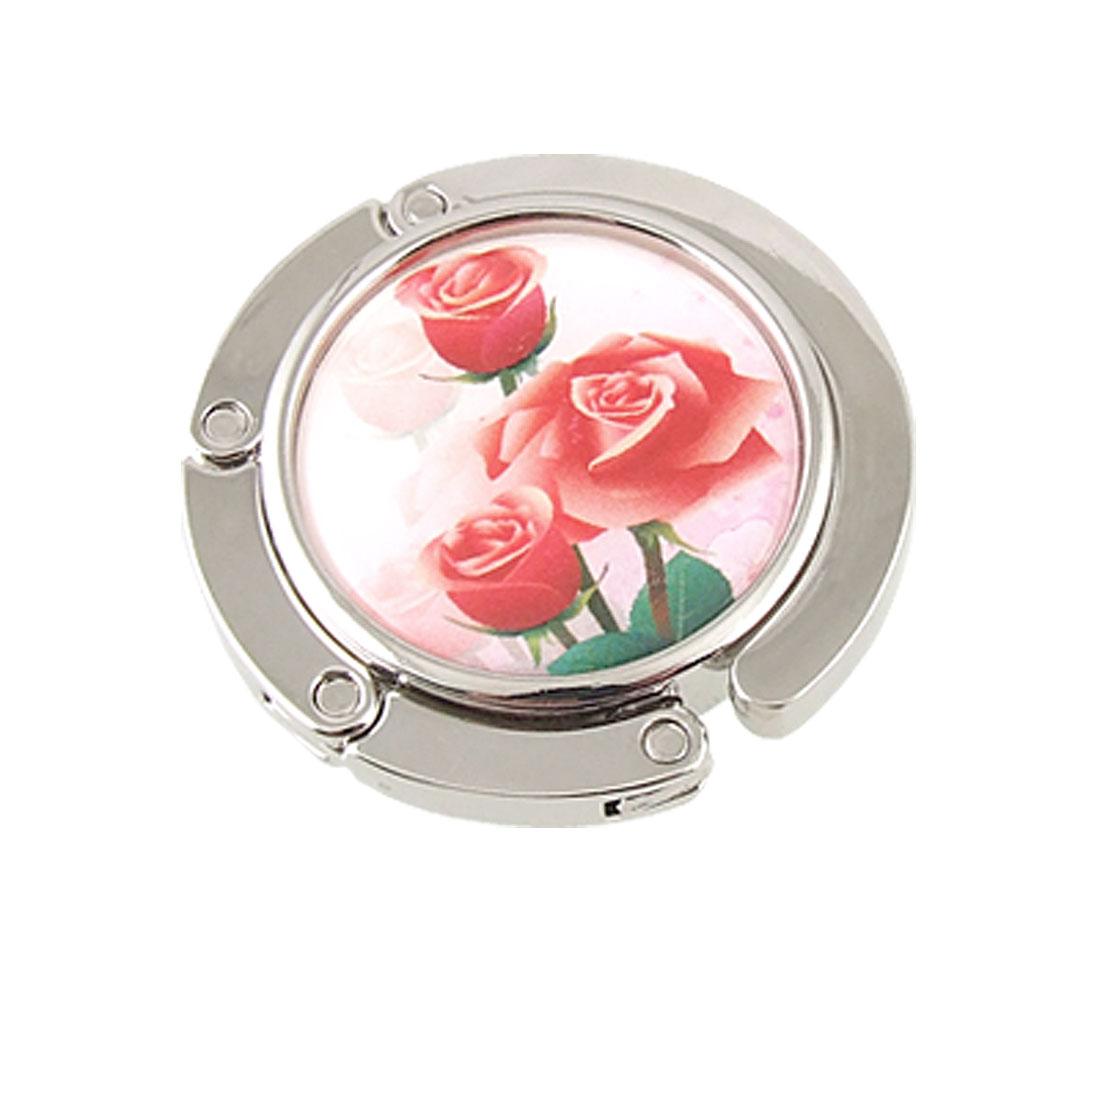 Red Rose Flowers Alloy Foldable Handbag Hook Table Hanger for Lady